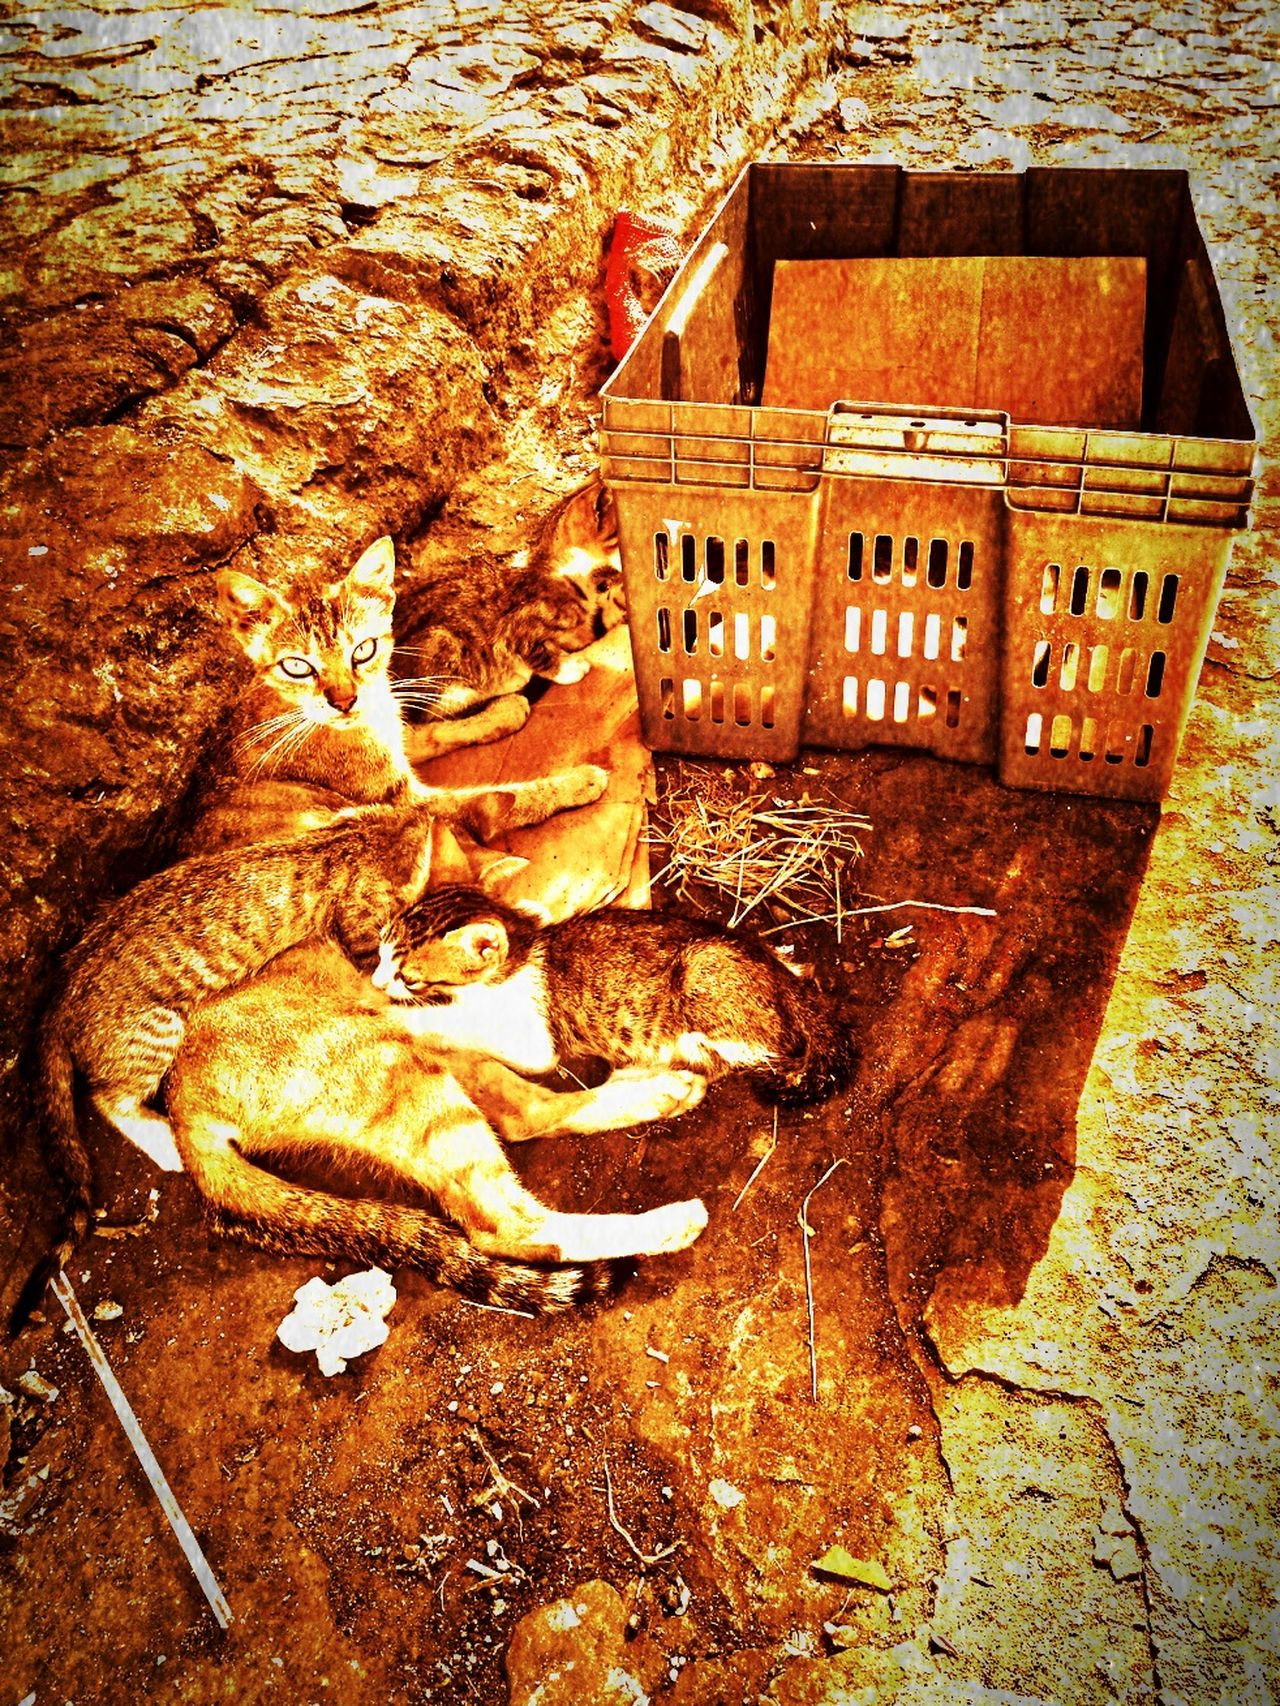 Seven kittens and mom. Bygone Wet Plate Bygone Times Sepia Nostalgia Beauty In Nature Eyem Best Shots